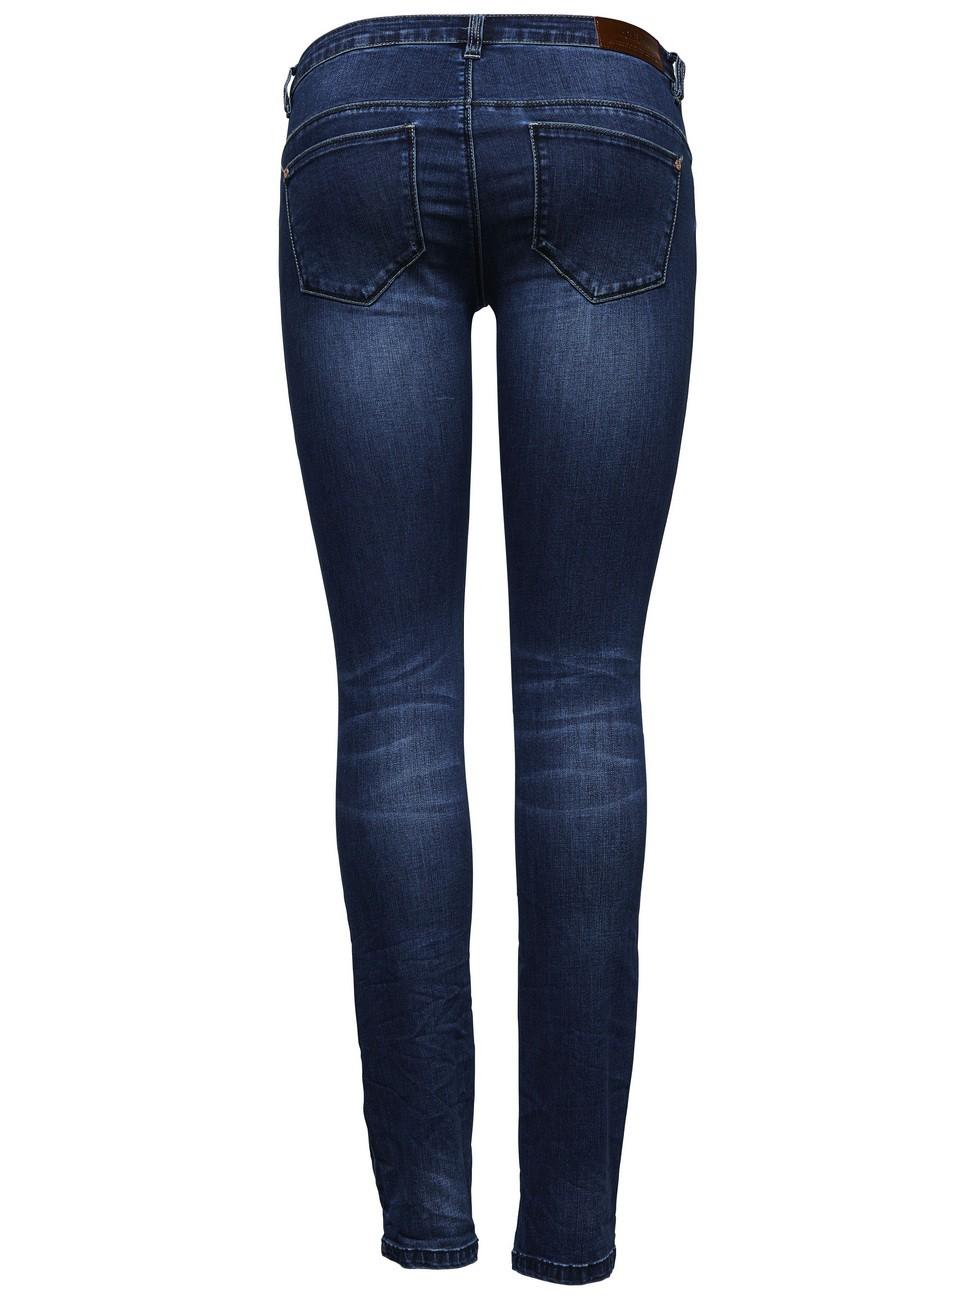 Only Damen Jeans onlCORAL - Skinny Fit - Medium Blue Denim